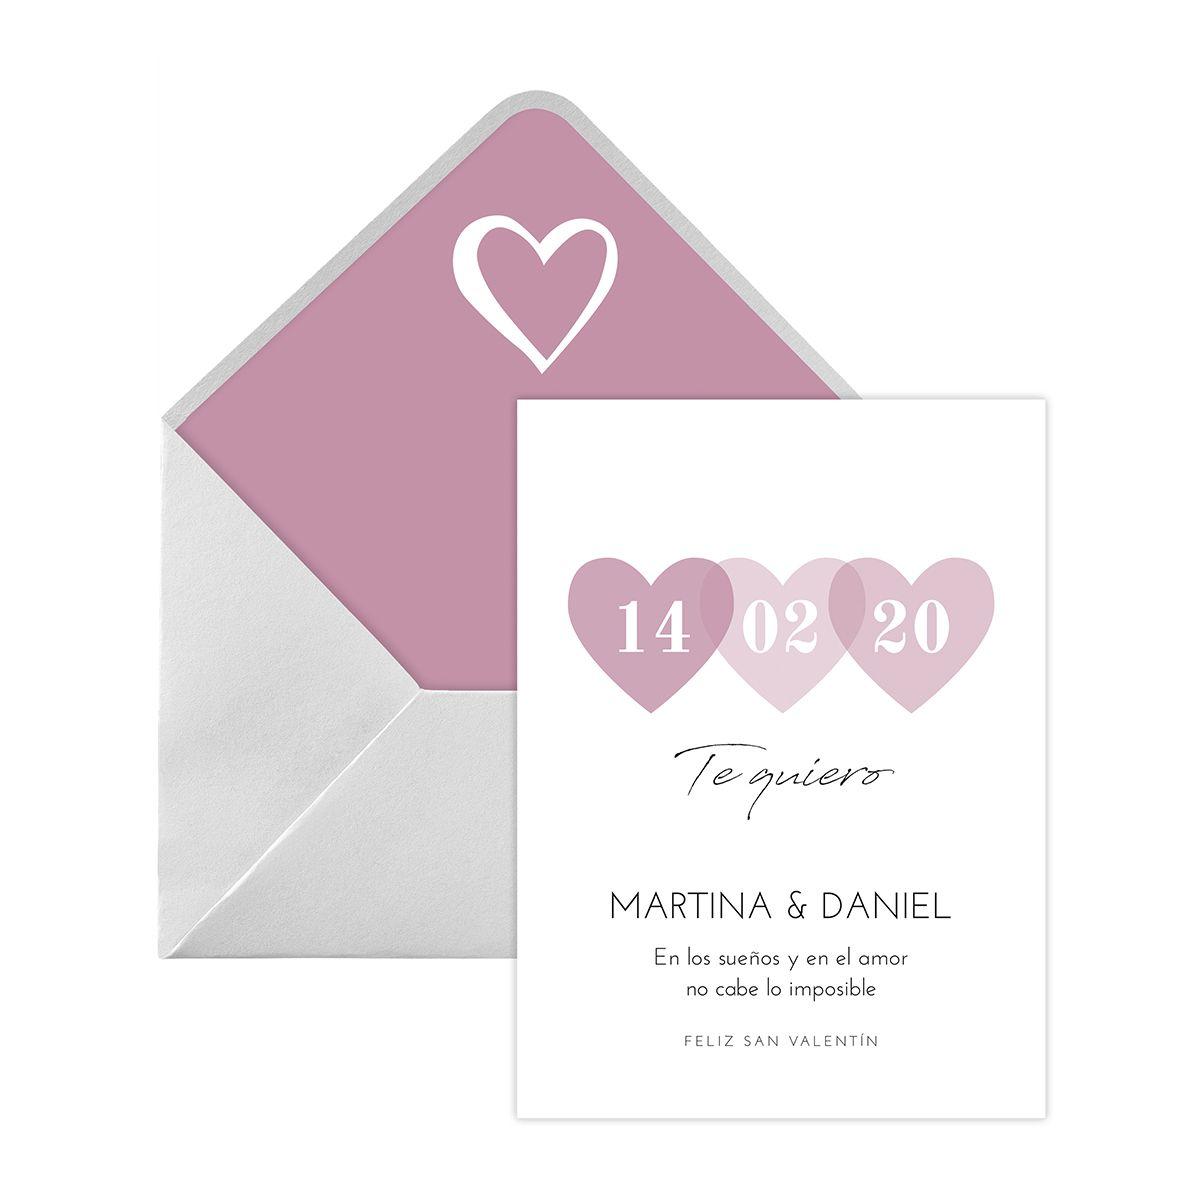 San Valentin Confetti Digital